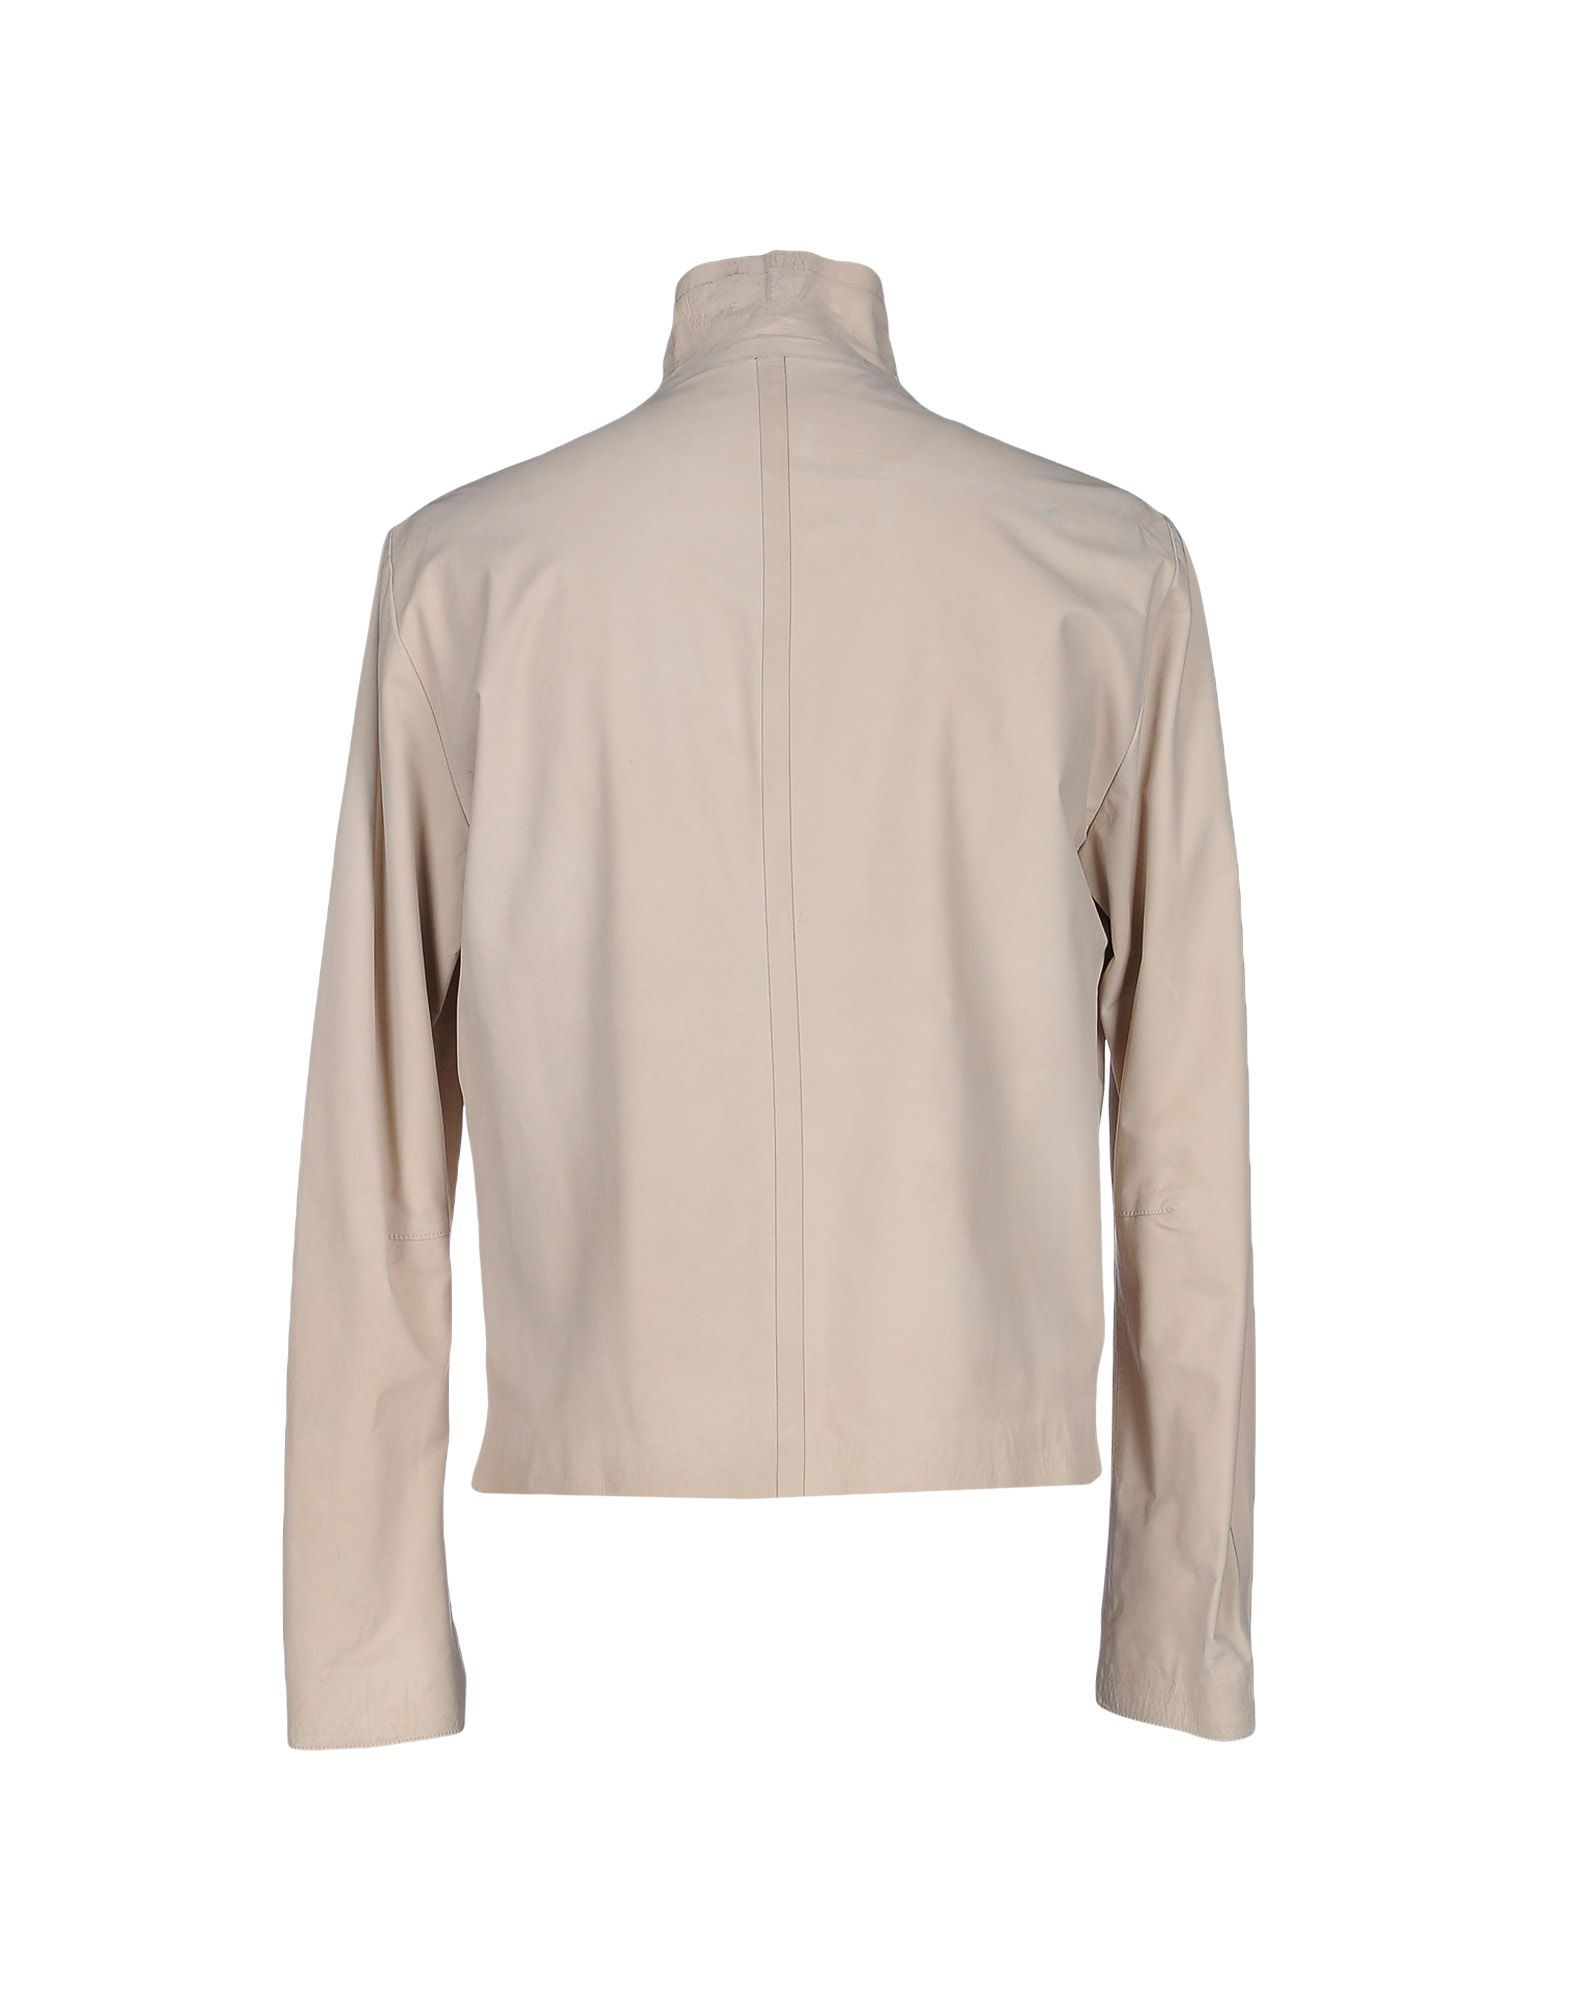 Emporio Armani Ivory Calf Leather Jacket